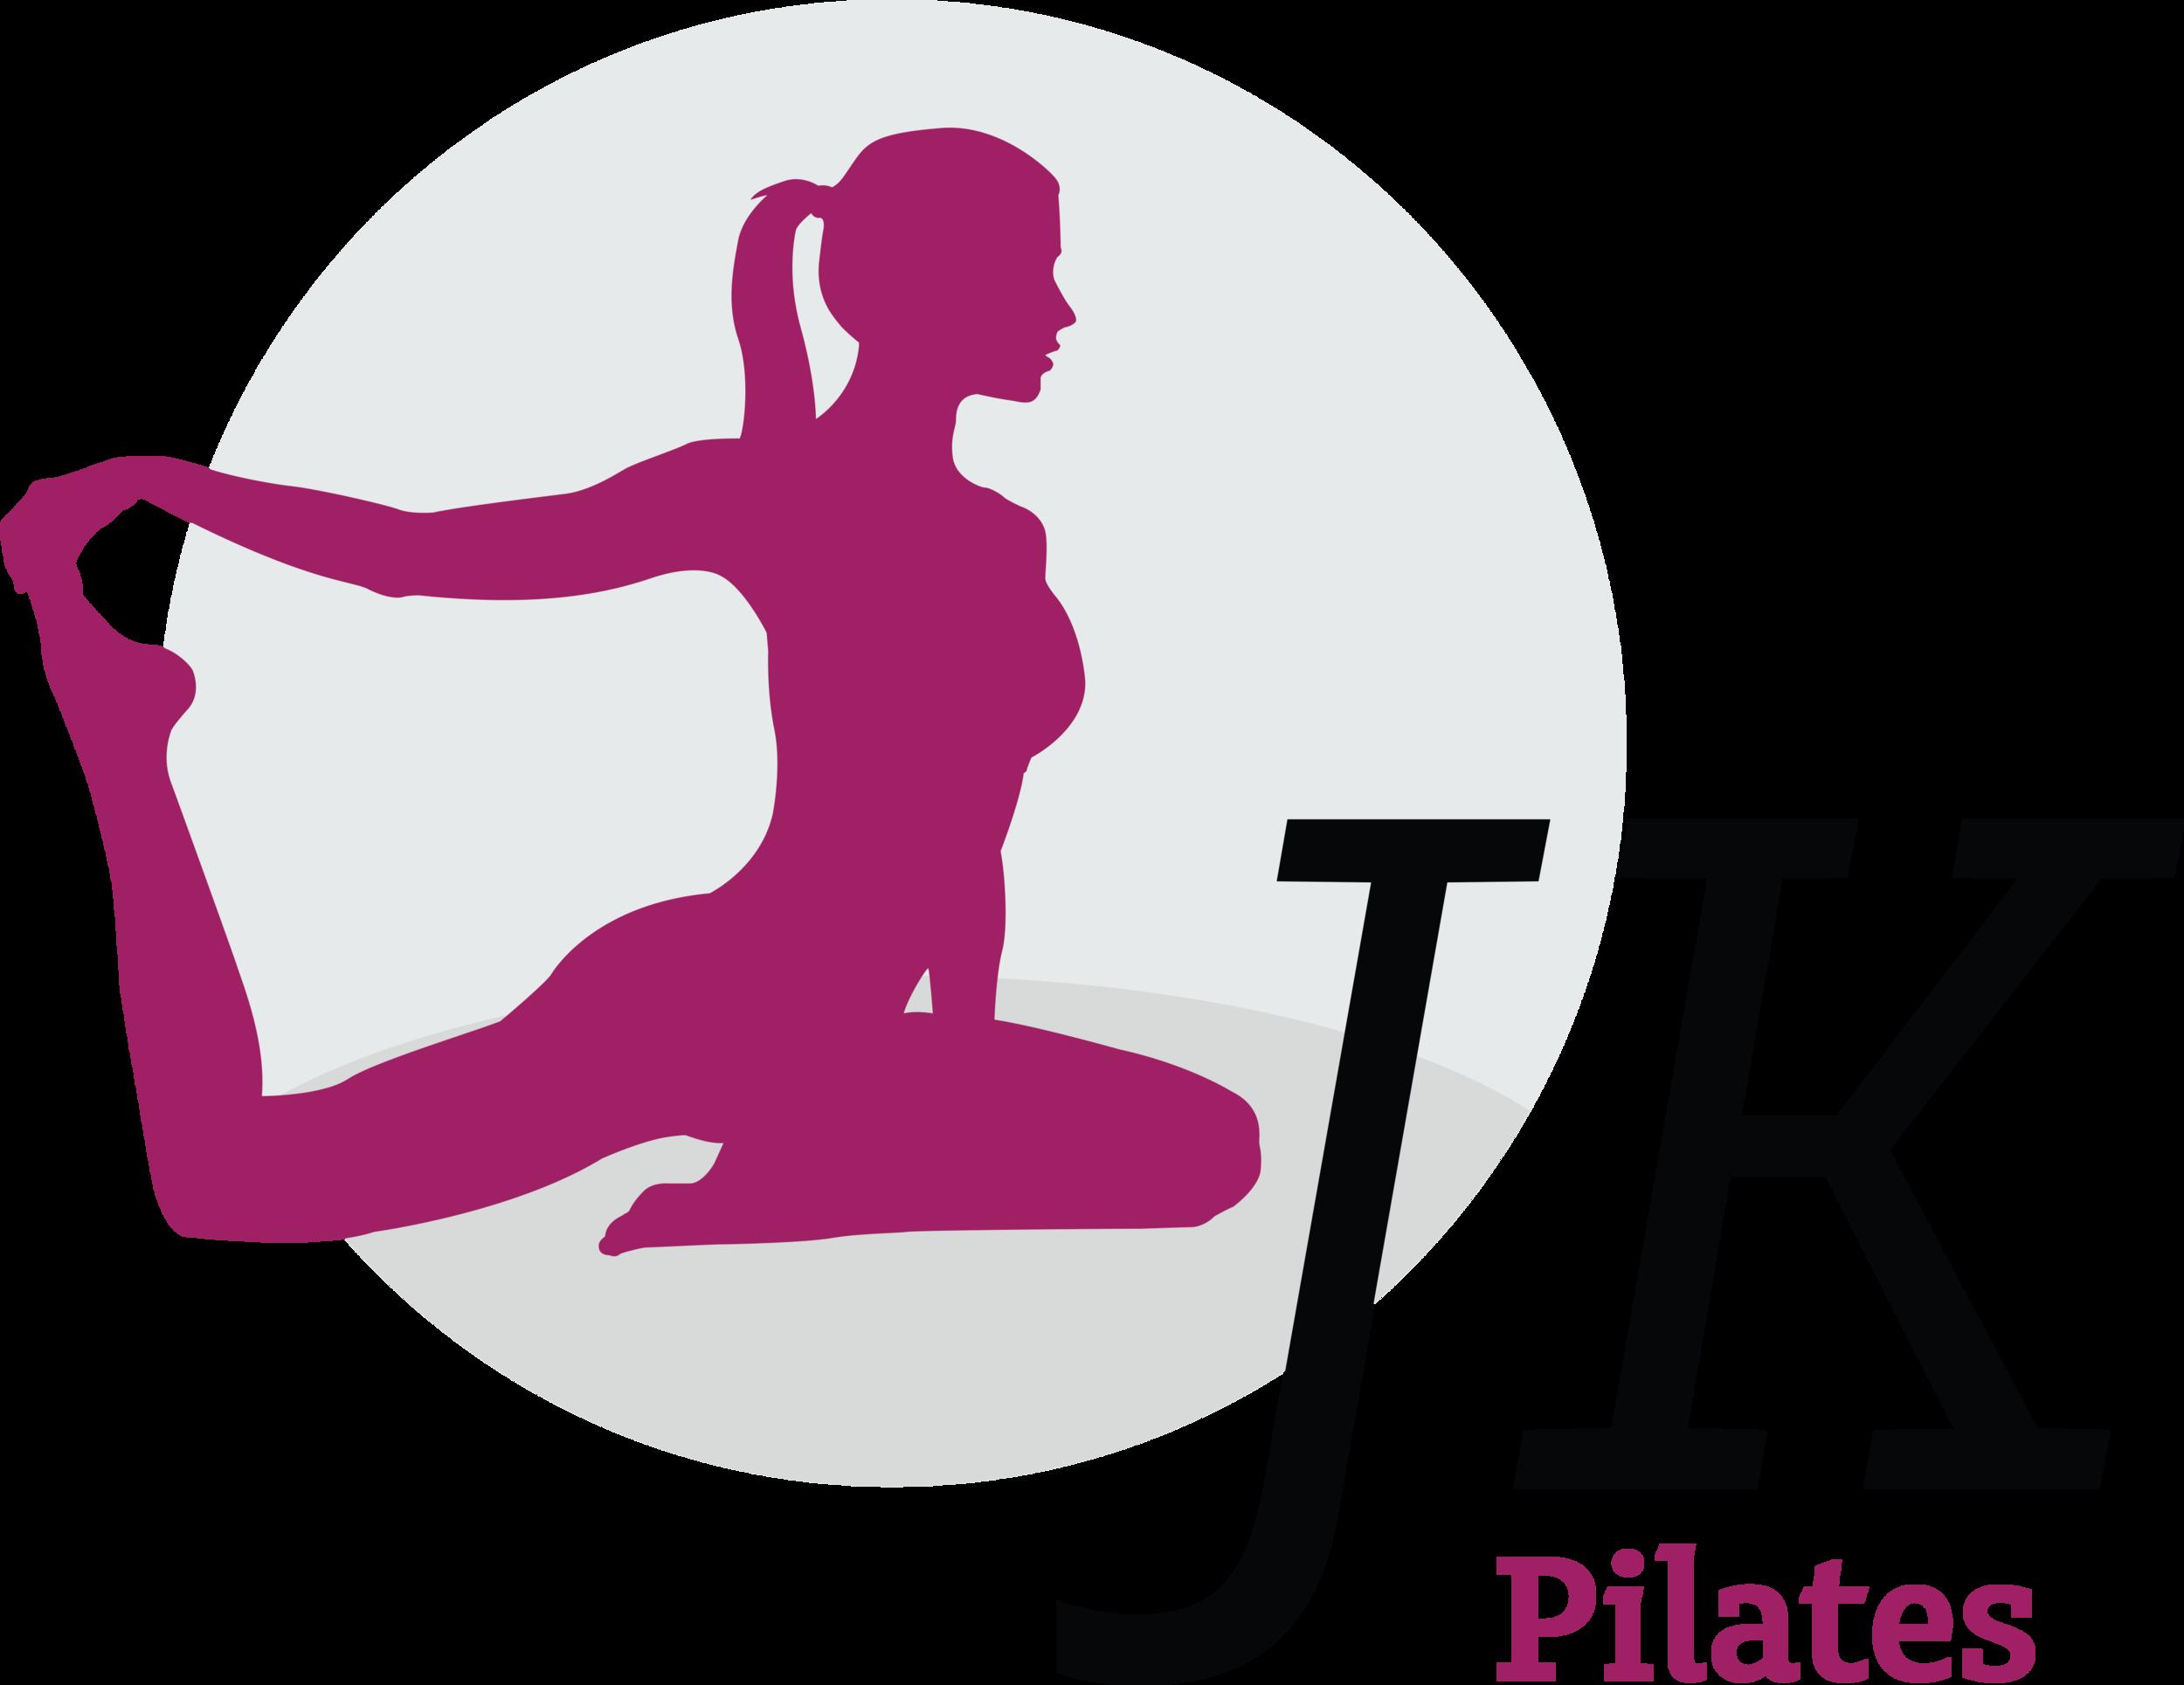 jk_pilates_cmyk.png